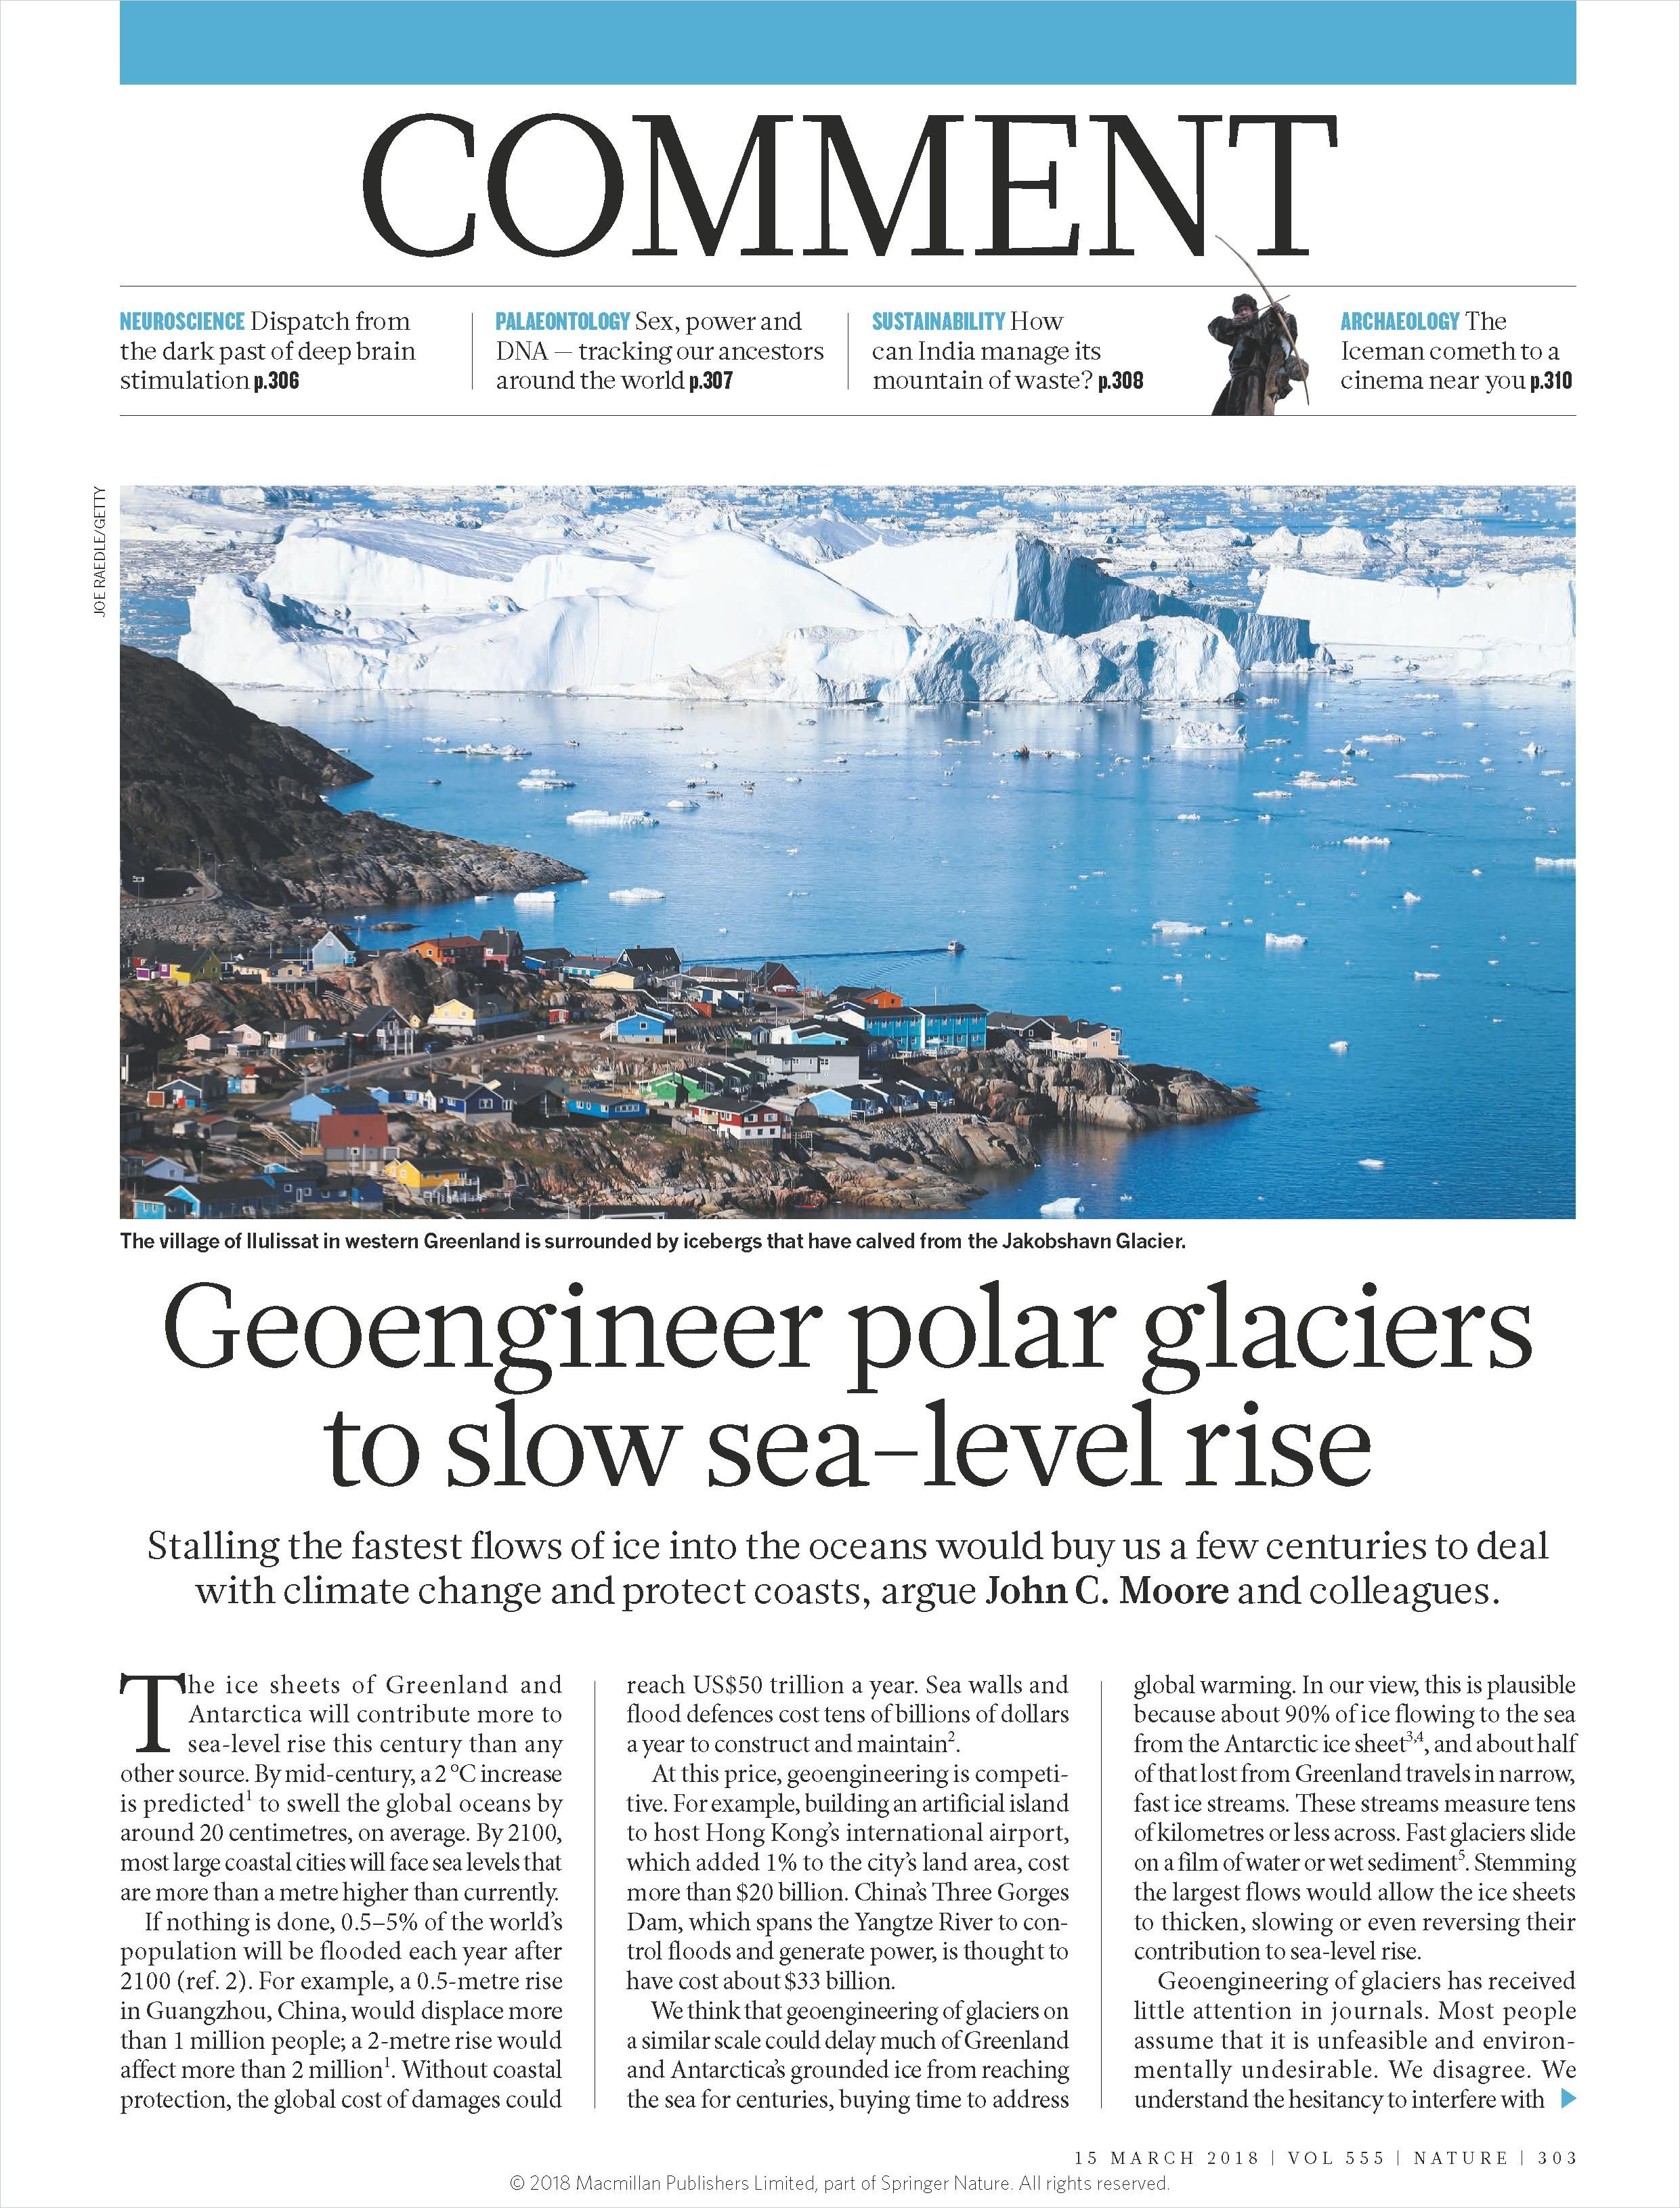 Image of: Geoengineer Polar Glaciers to Slow Sea-Level Rise